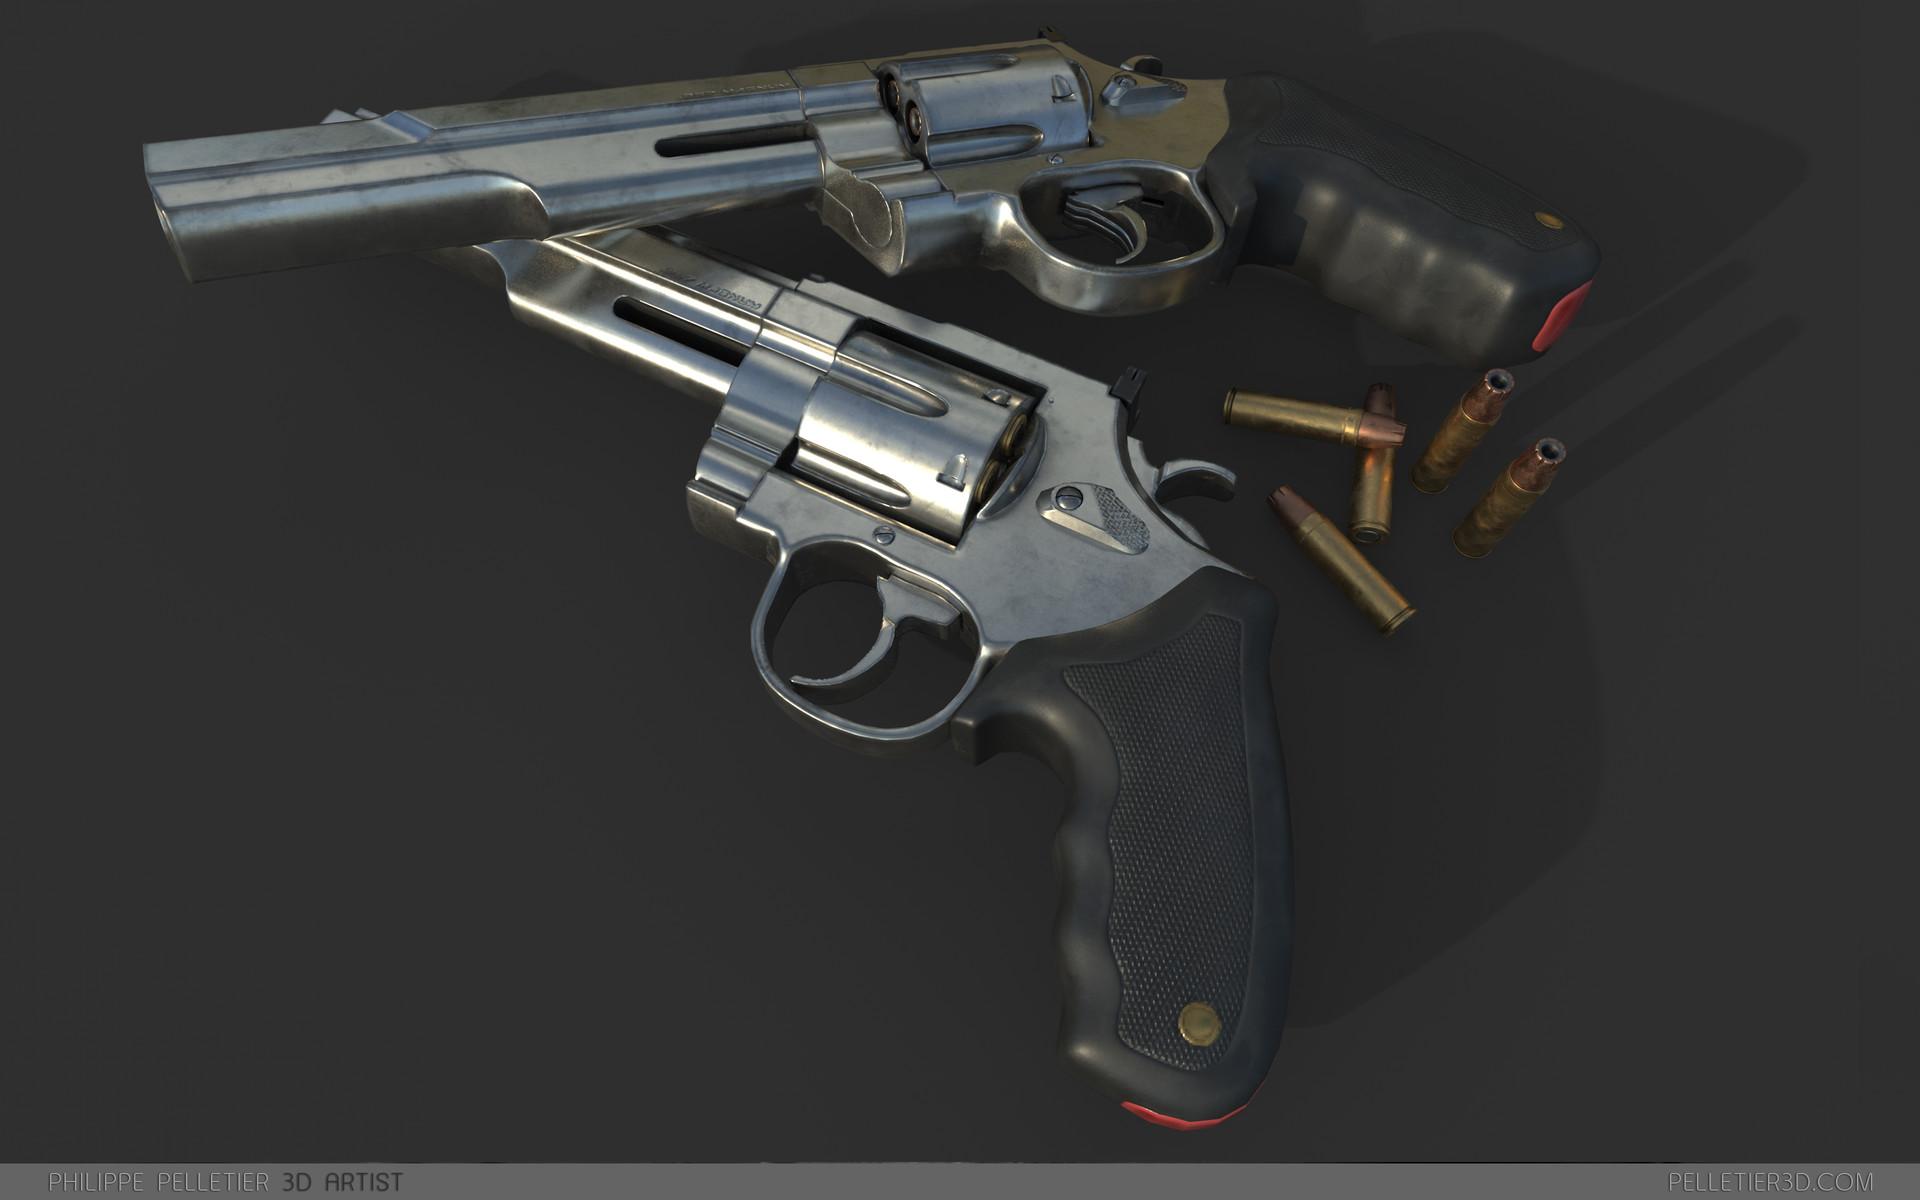 Philippe pelletier revolver 001